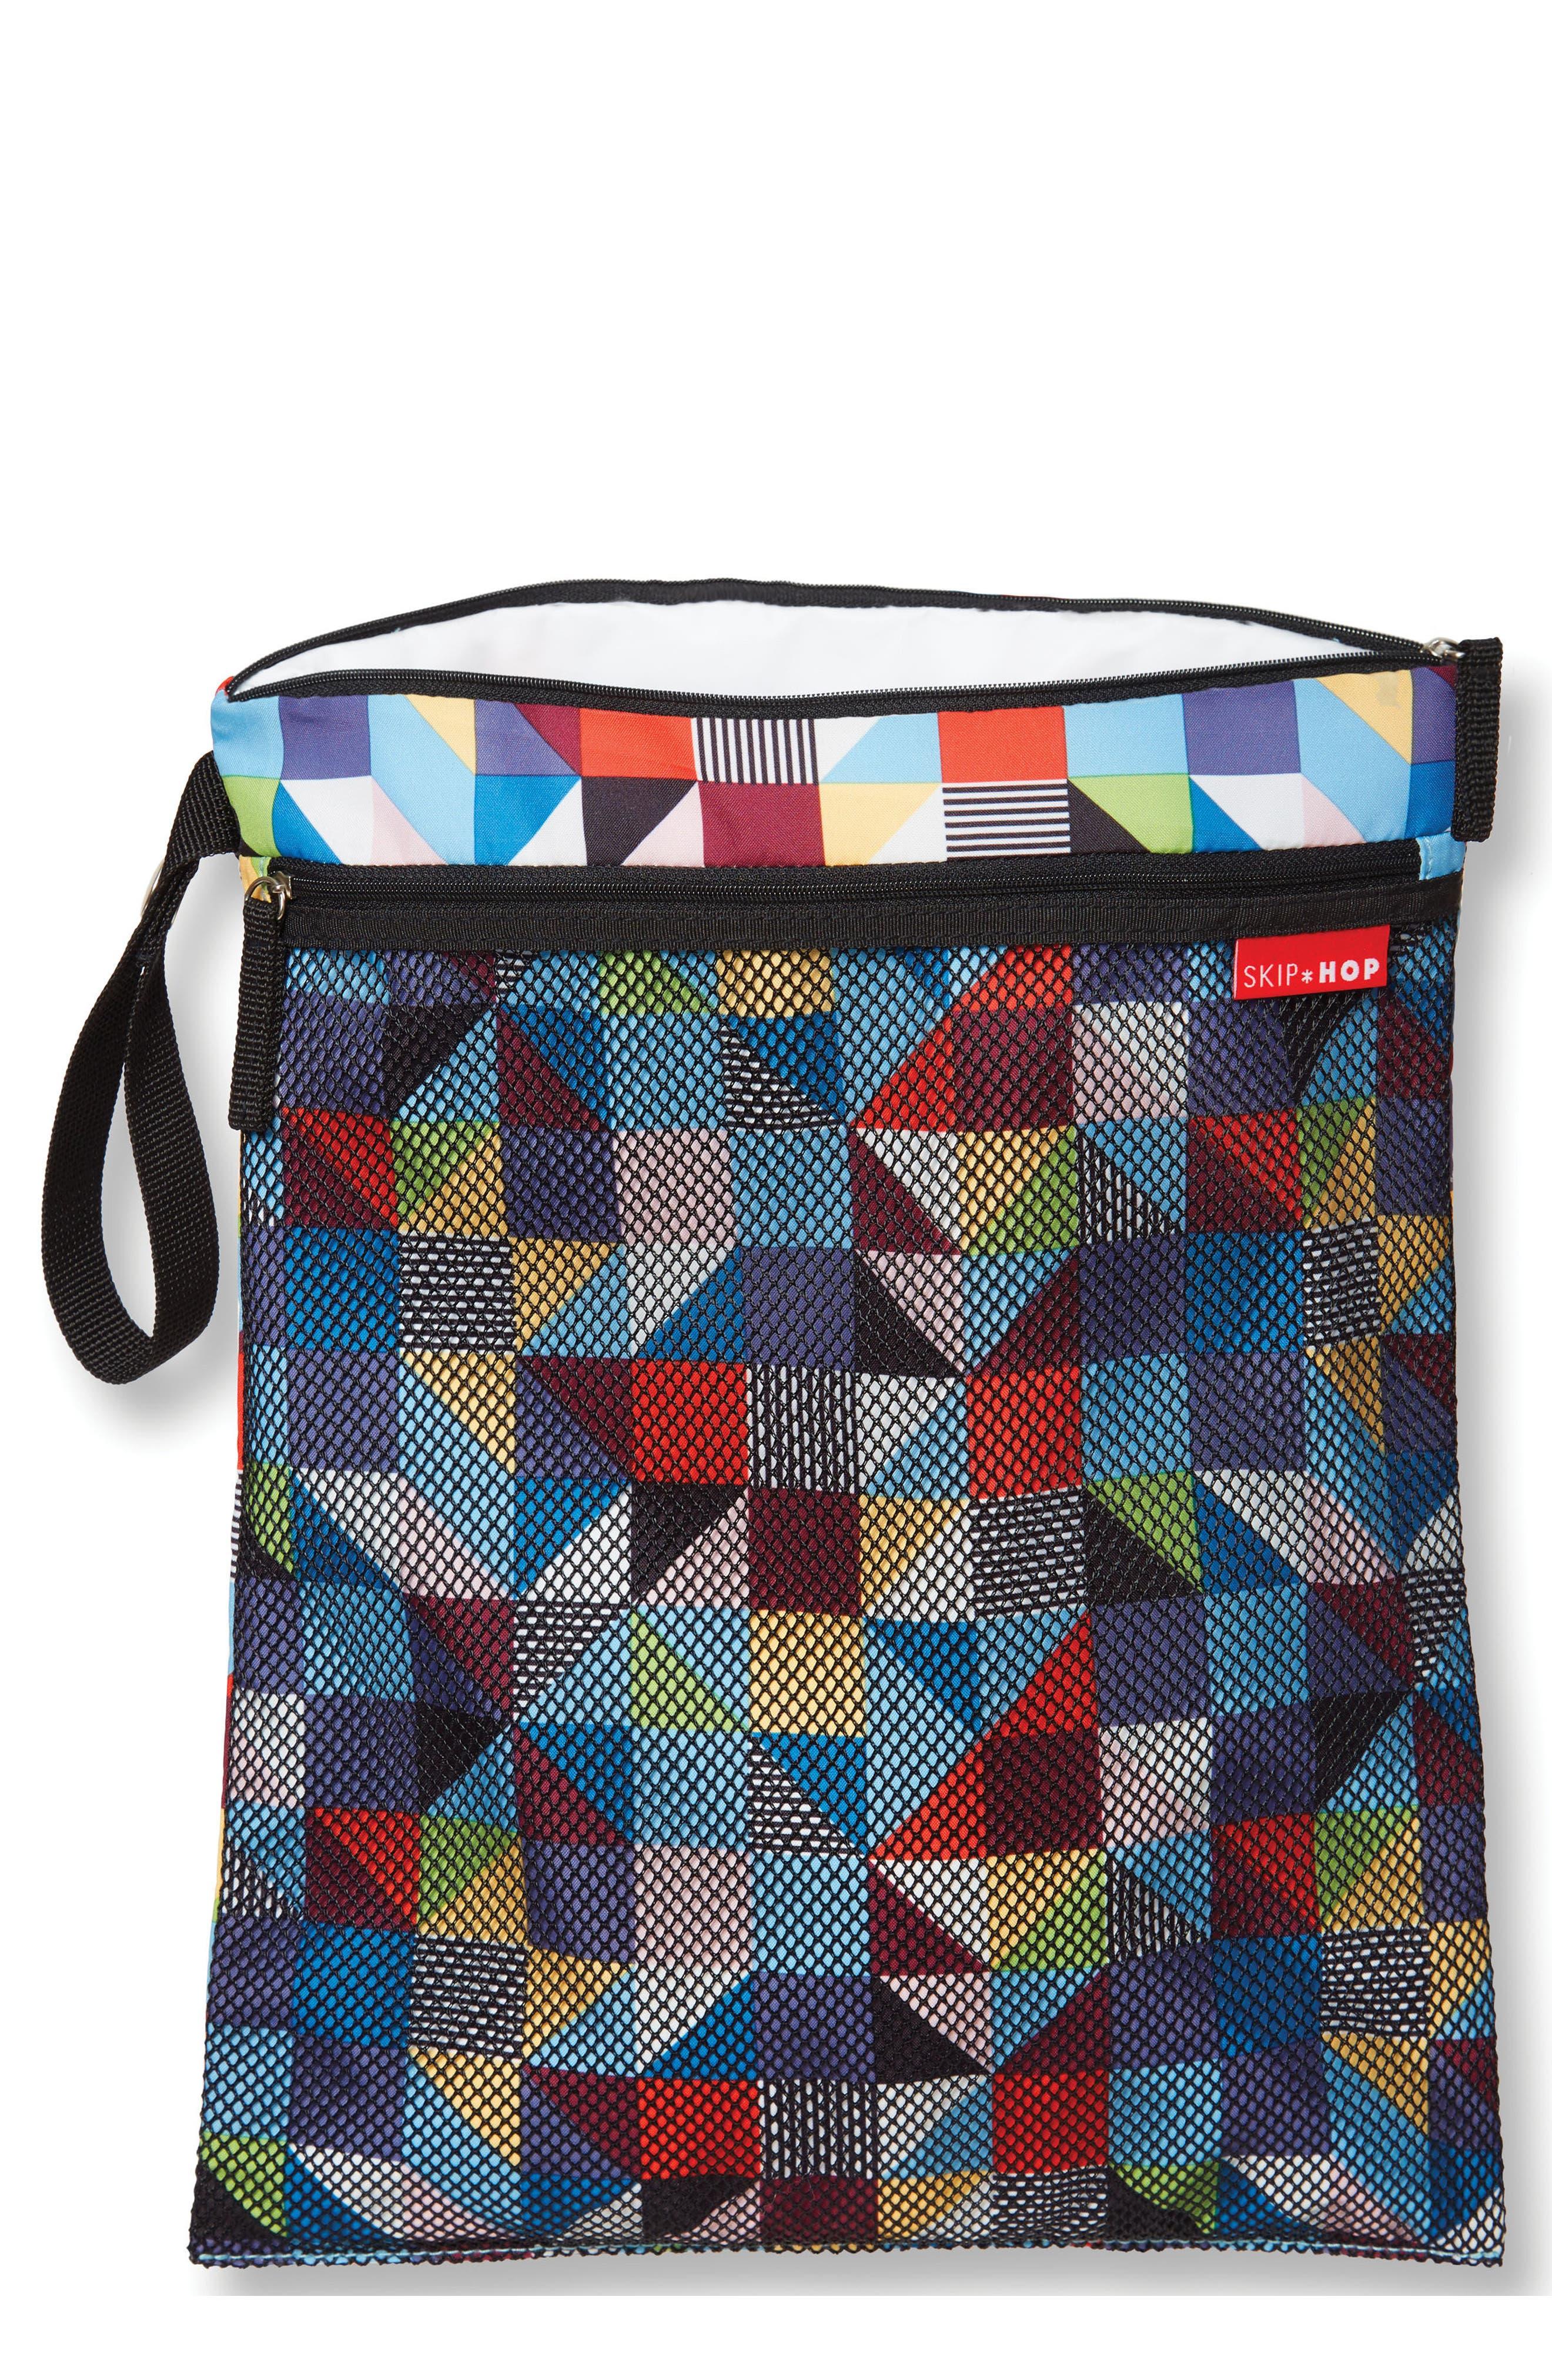 Skip Hop 'Grab & Go' Wet/Dry Bag